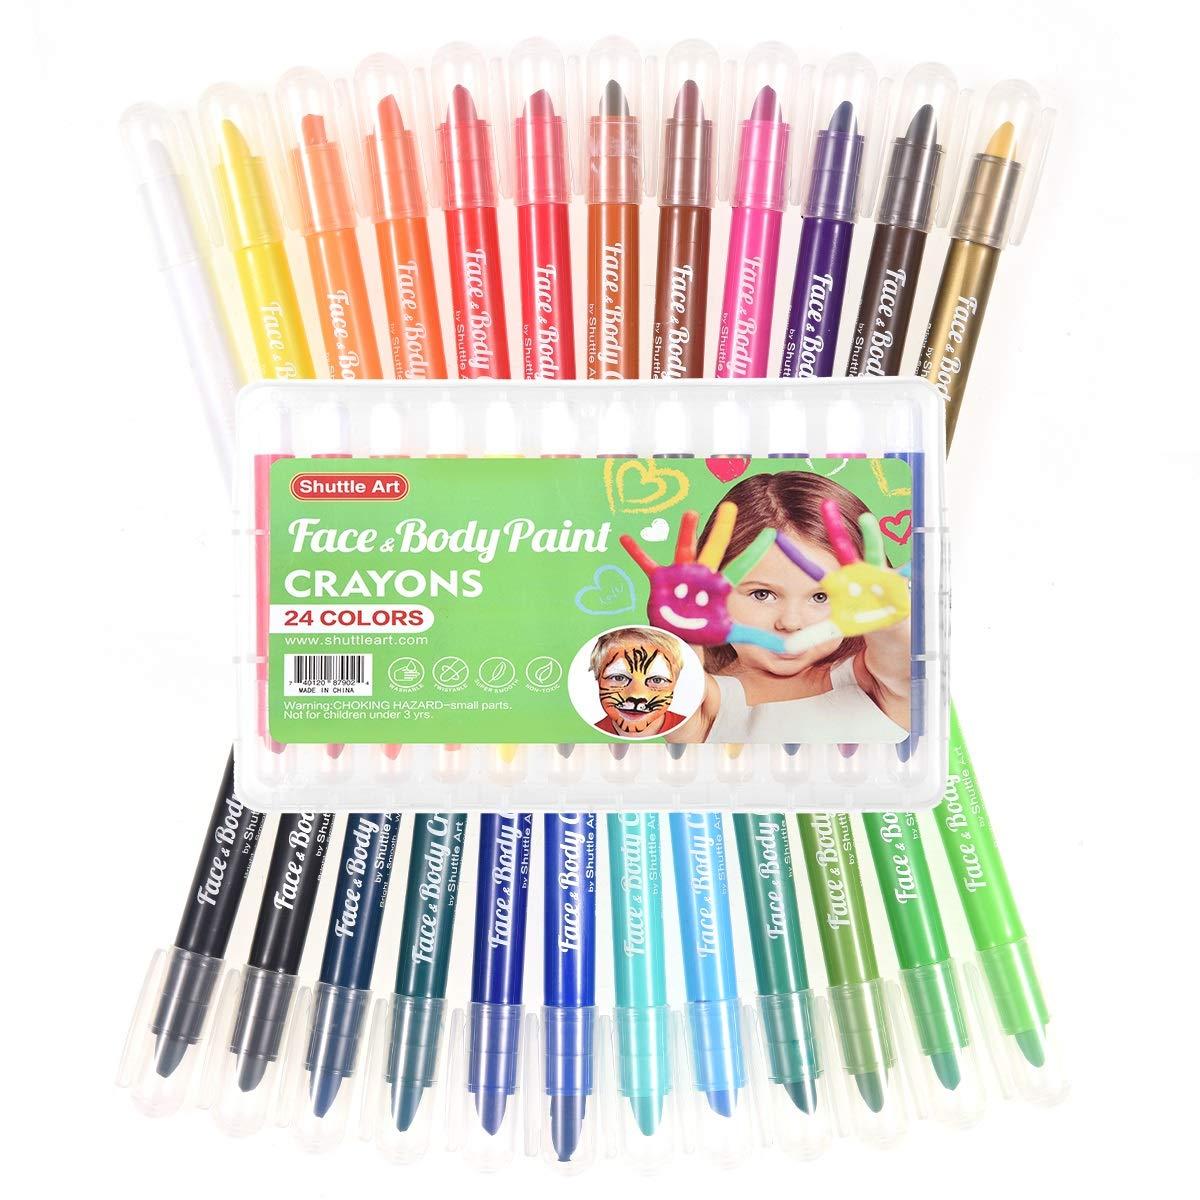 Face Paint Kit for Kids,Shuttle Art 24 Colors Face Painting Party Set Body Paint Kit Non-Toxic Body Face Painting Set